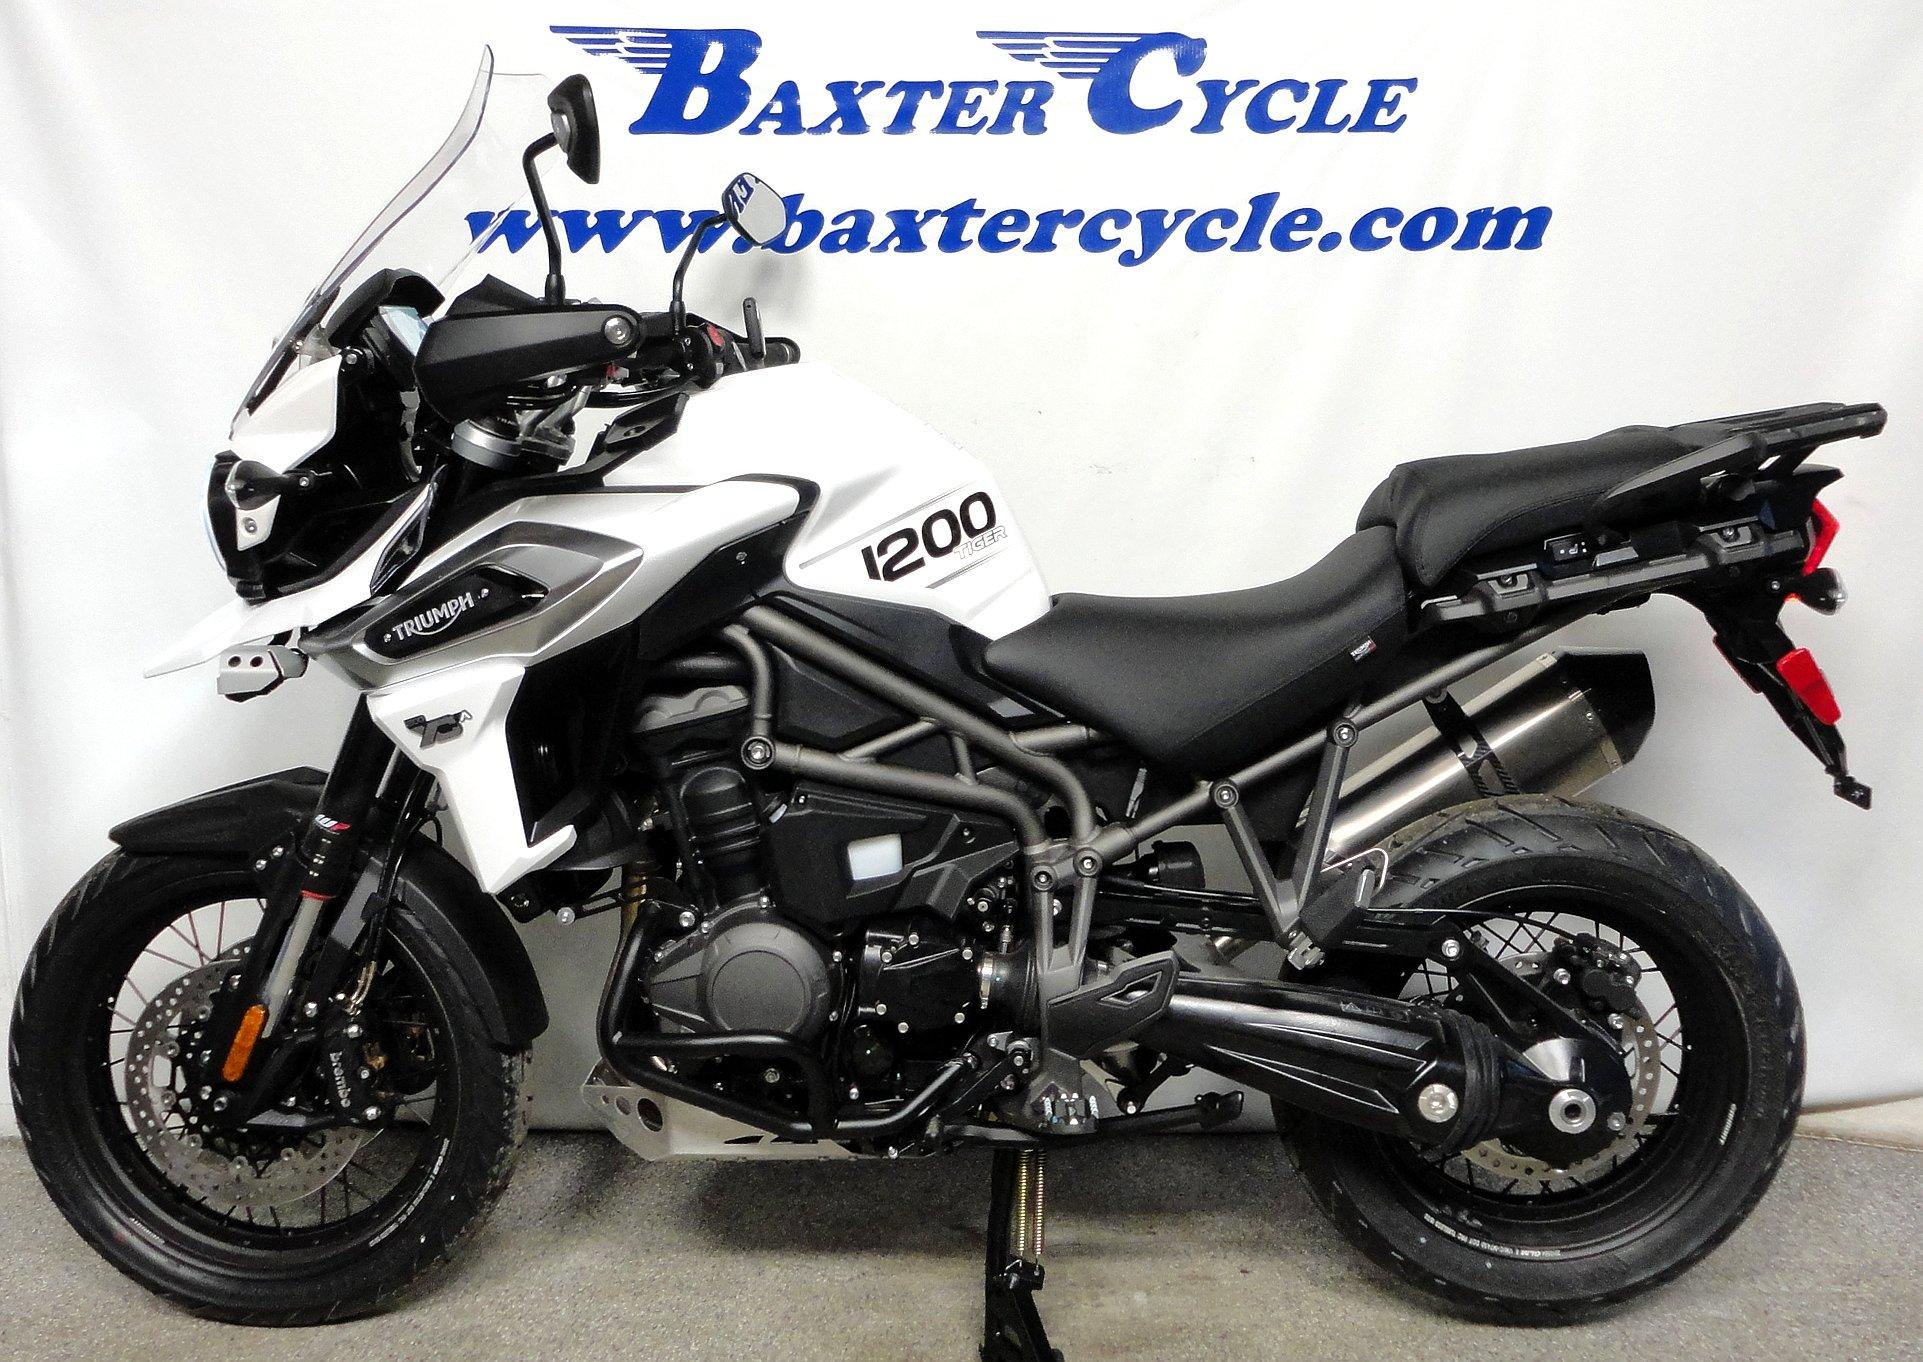 2019 Triumph Tiger 1200 Xca Baxter Cycle